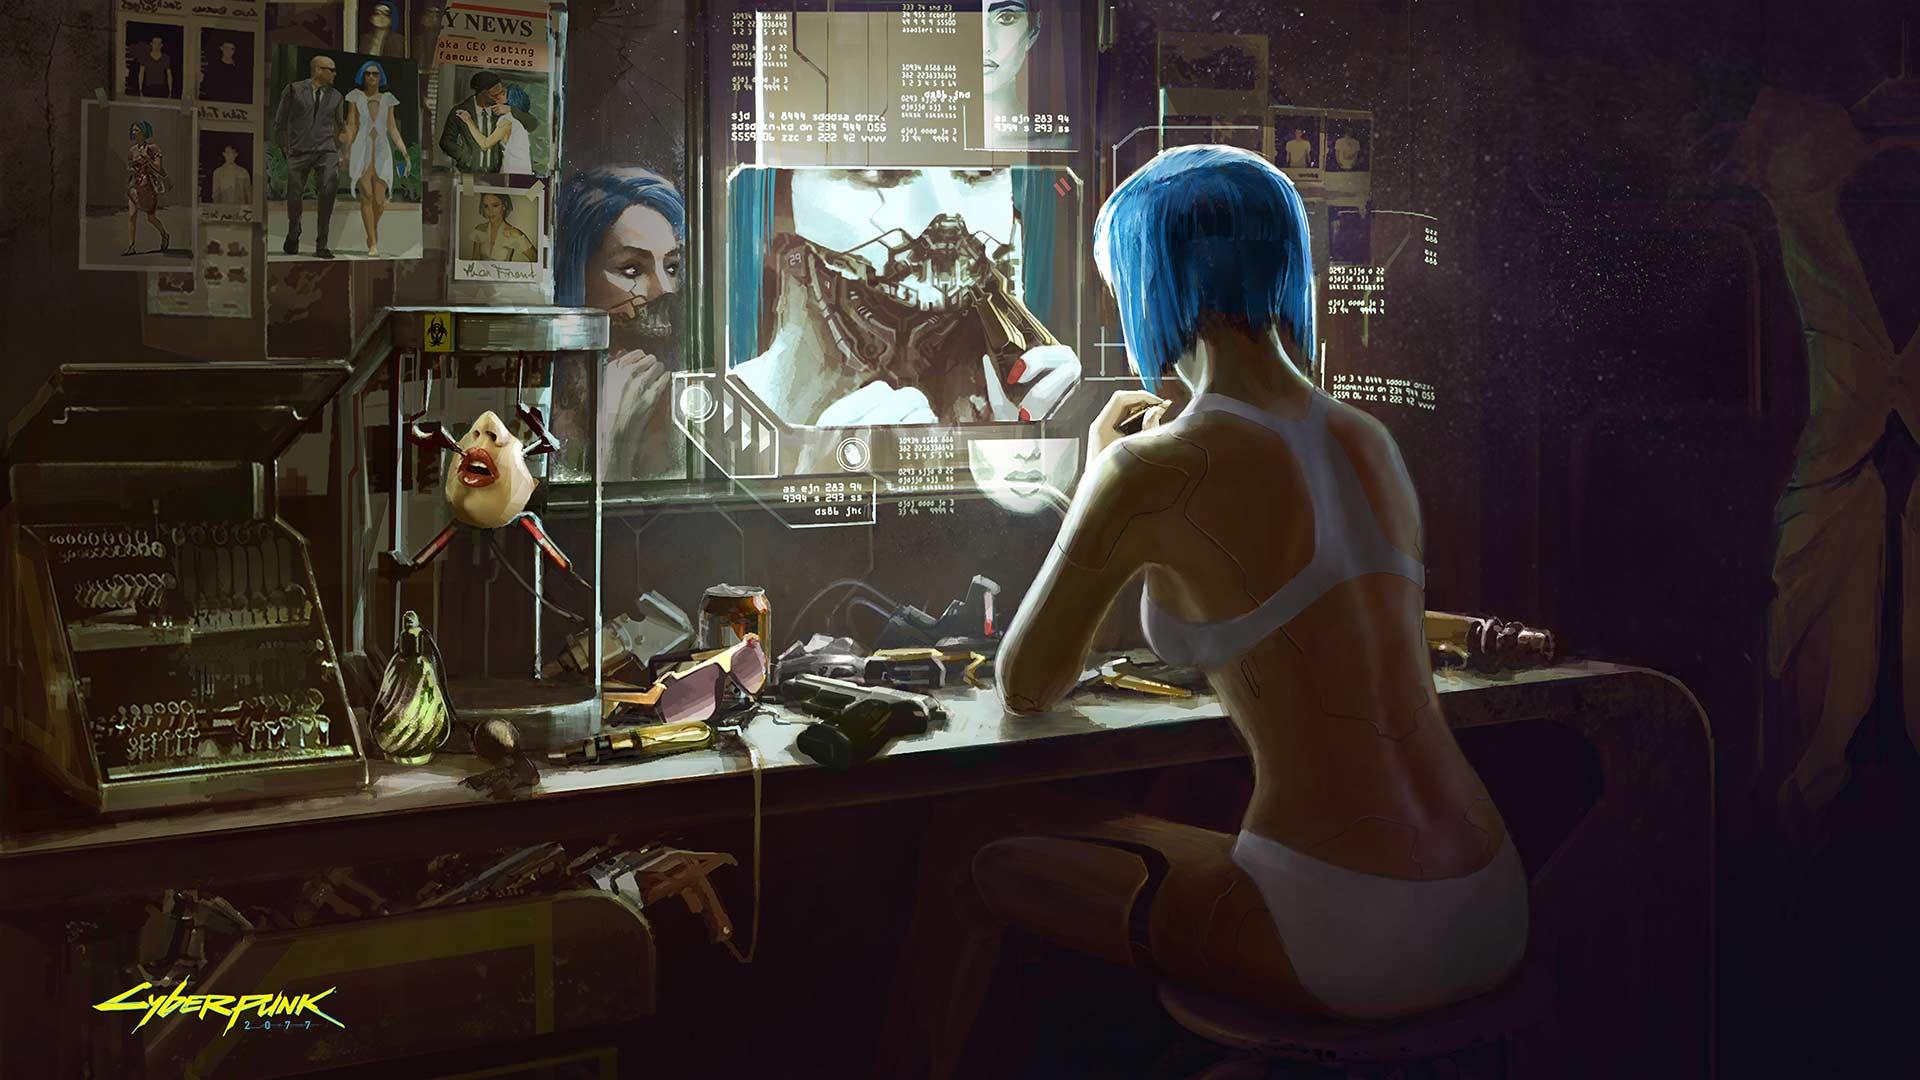 Cyberpunk 2077 Обои на рабочий стол, скрины, концепт арт